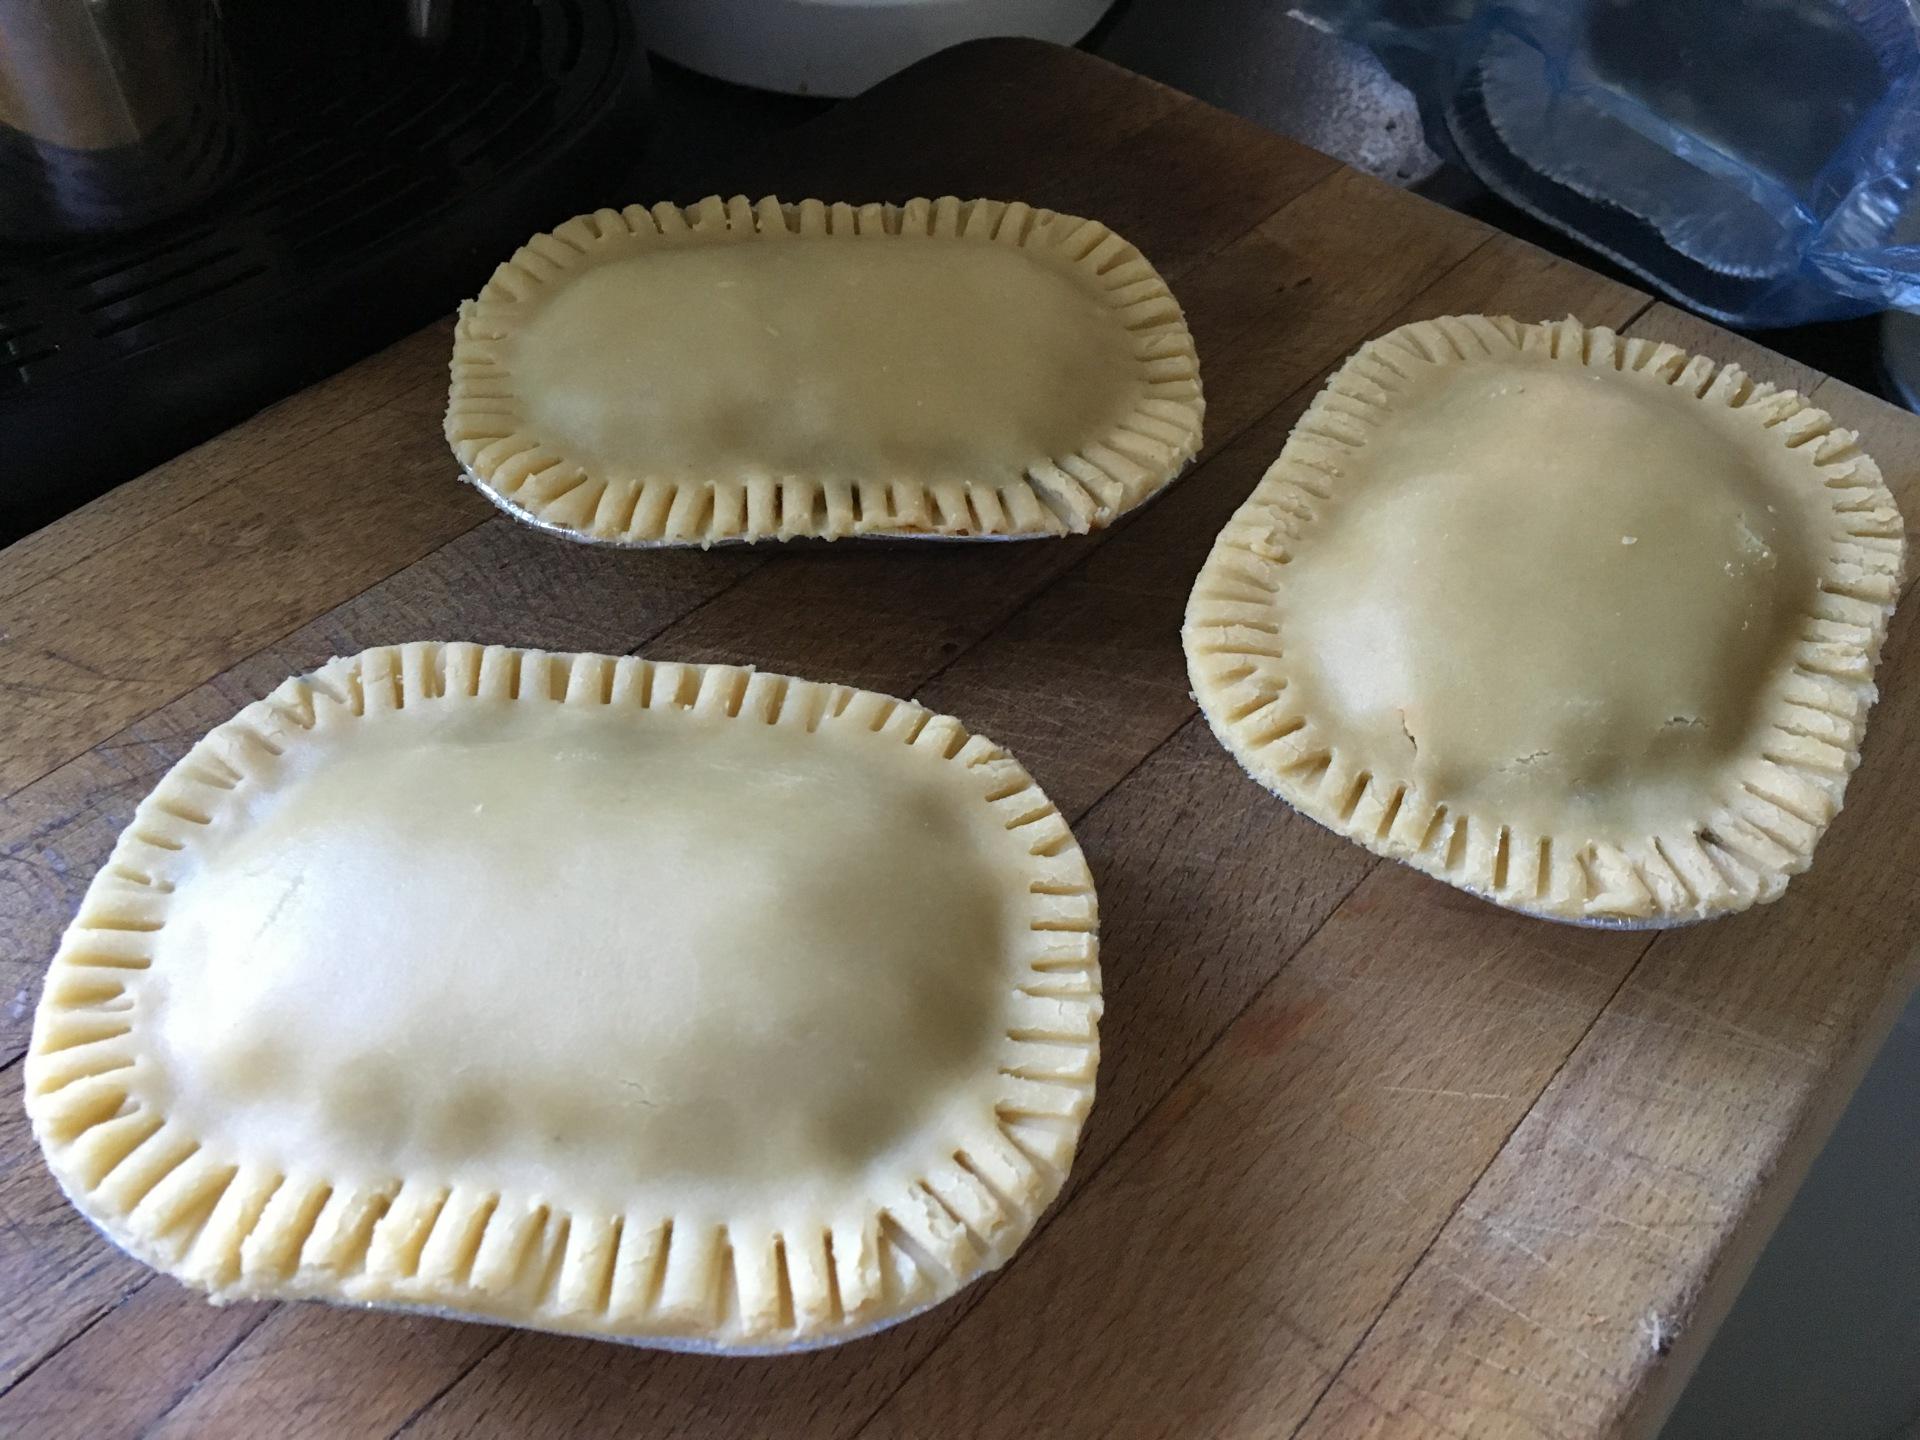 Crimp the pies